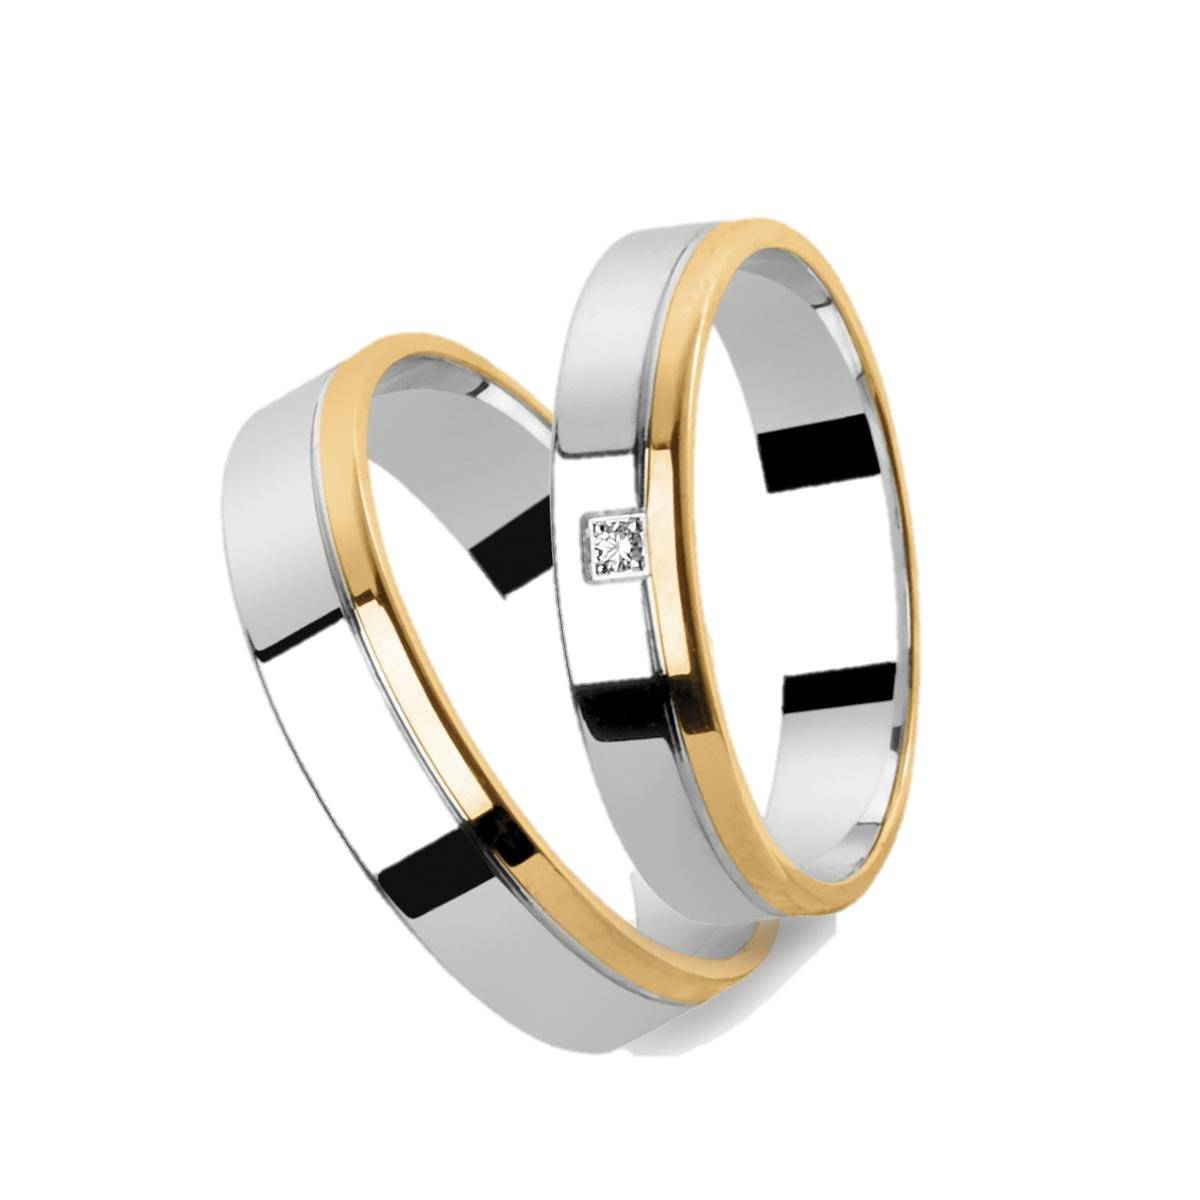 Juwelier Vandromme - Juwelen - Verlovingsring - Trouwring  – House of Weddings - 6